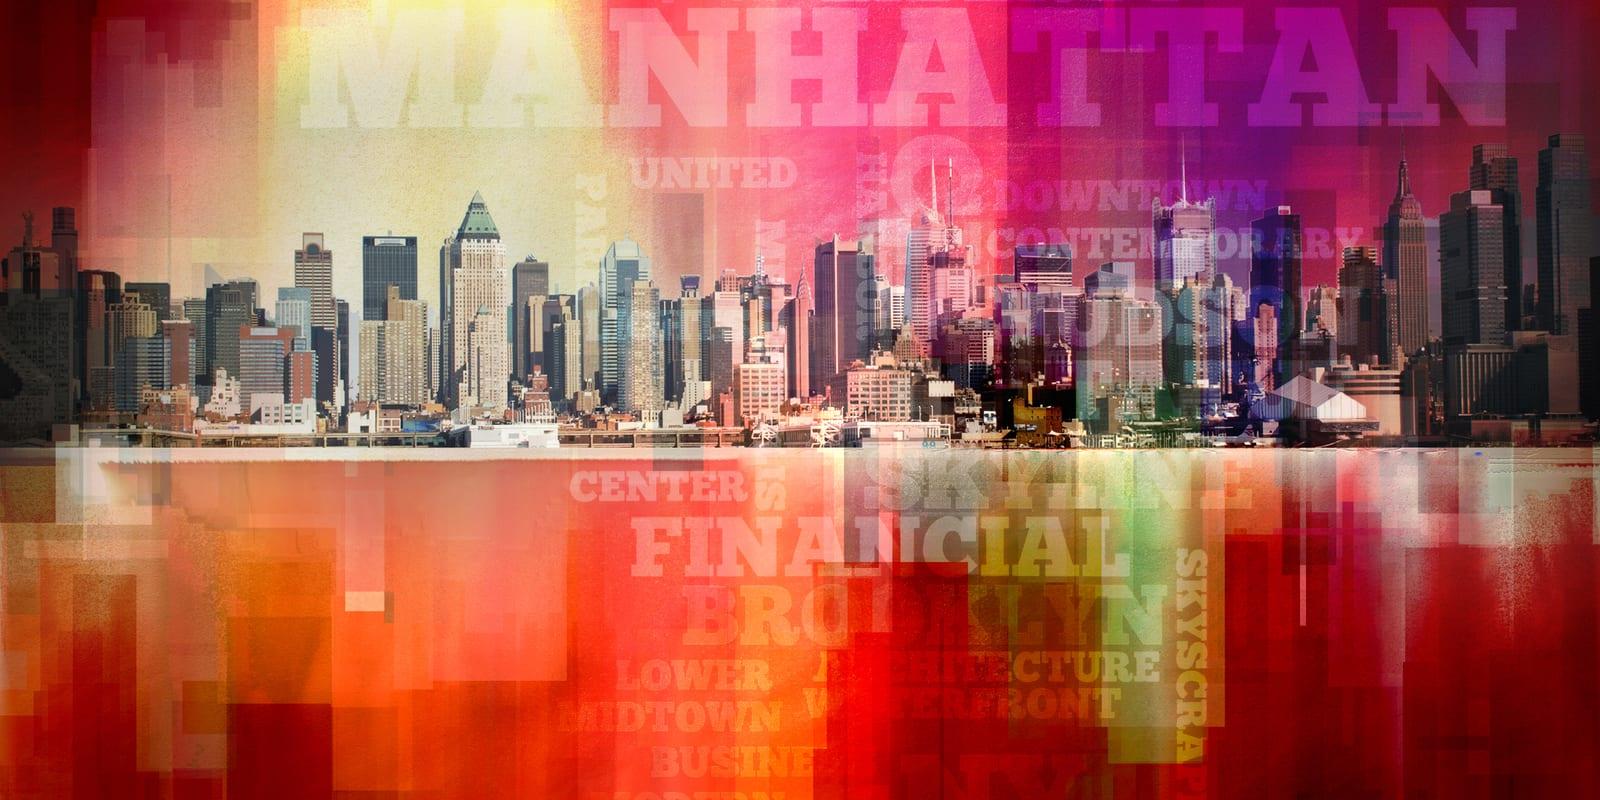 Washington Heights Manhattan, NY Private Investigator